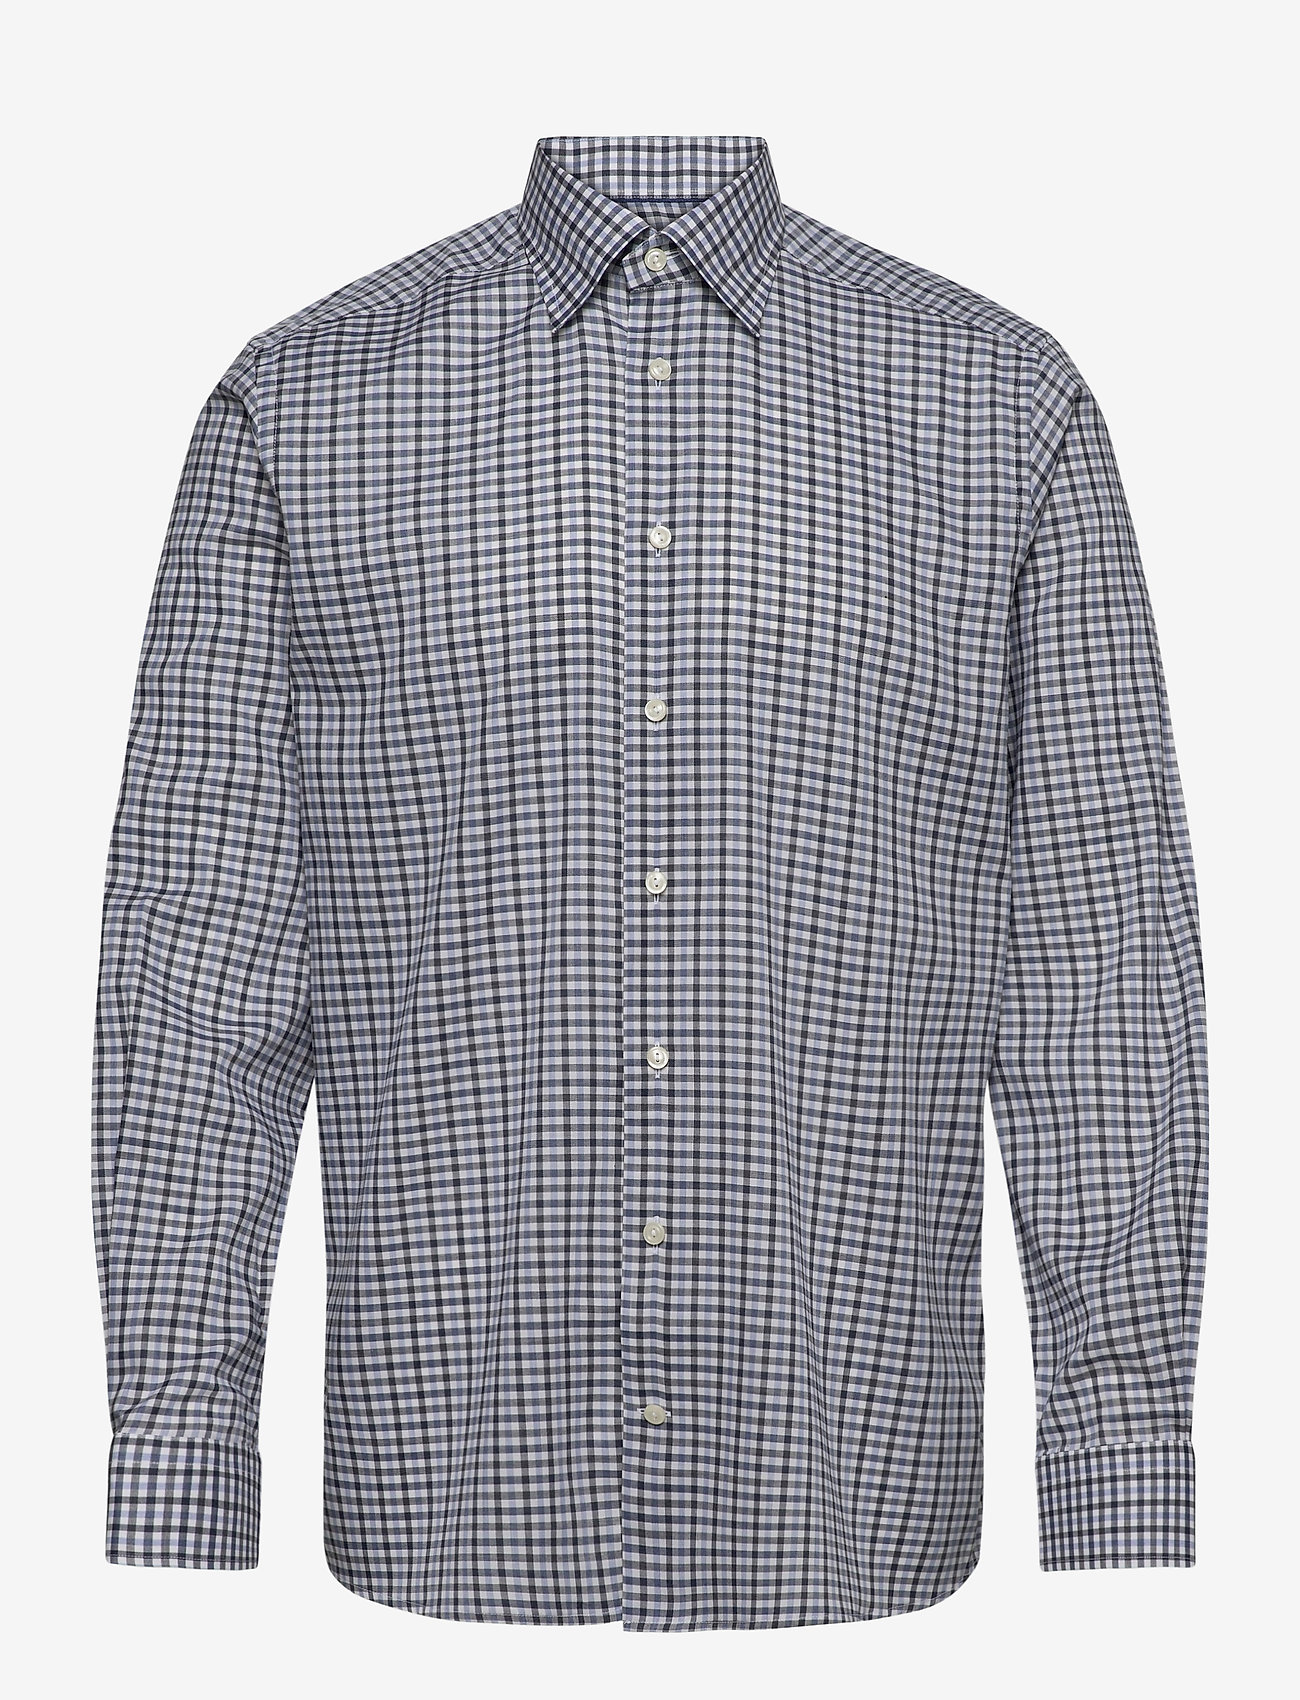 Blue & Navy Overcheck Flannel Shirt (Blue) (1799 kr) Eton